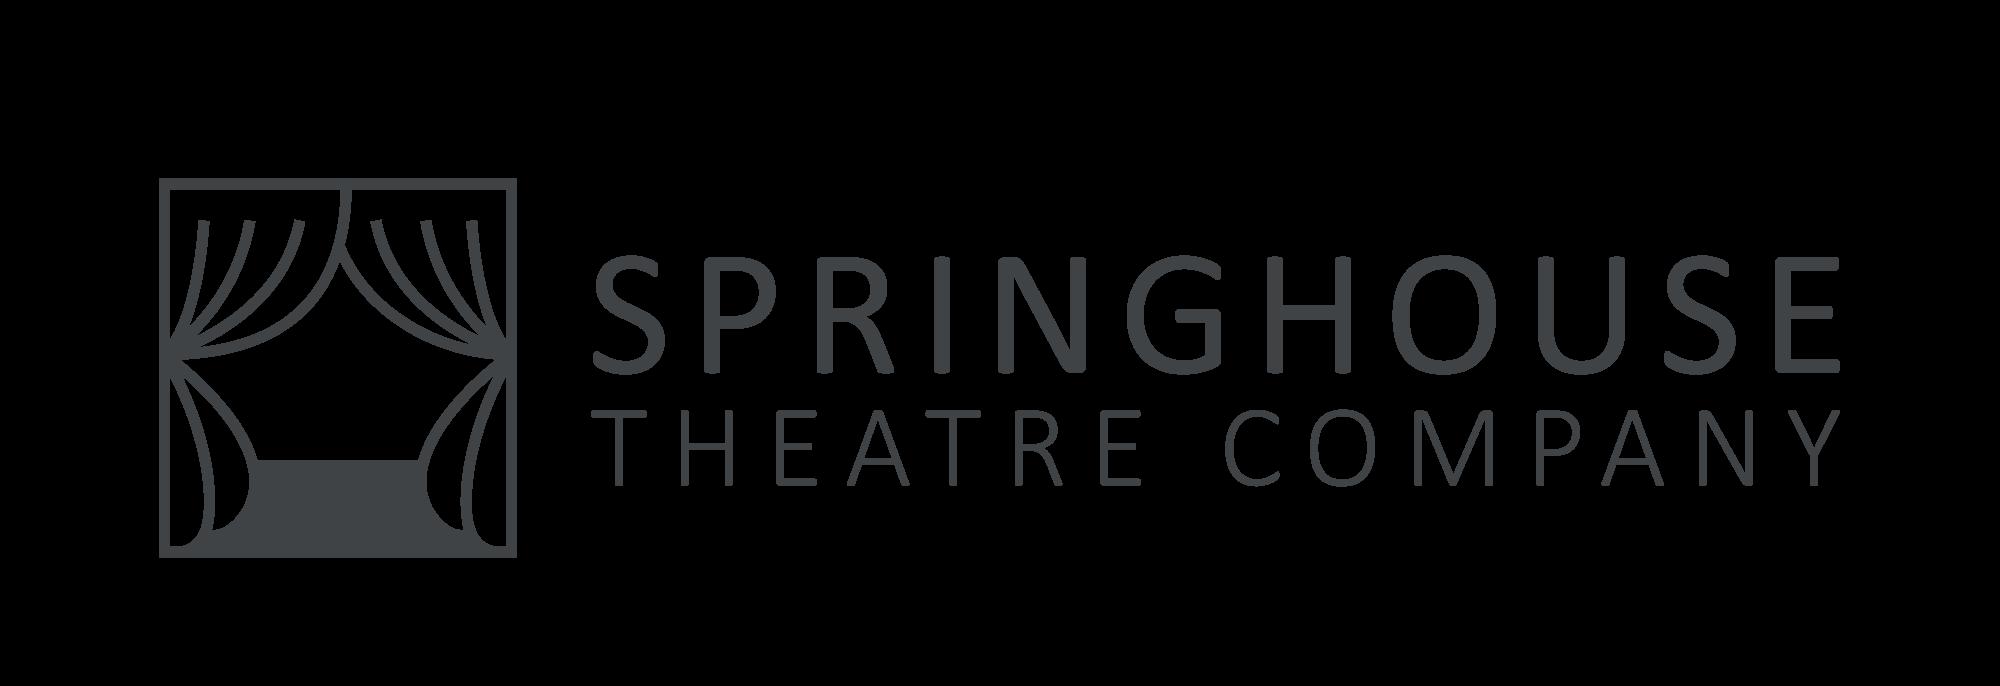 Springhouse Theatre